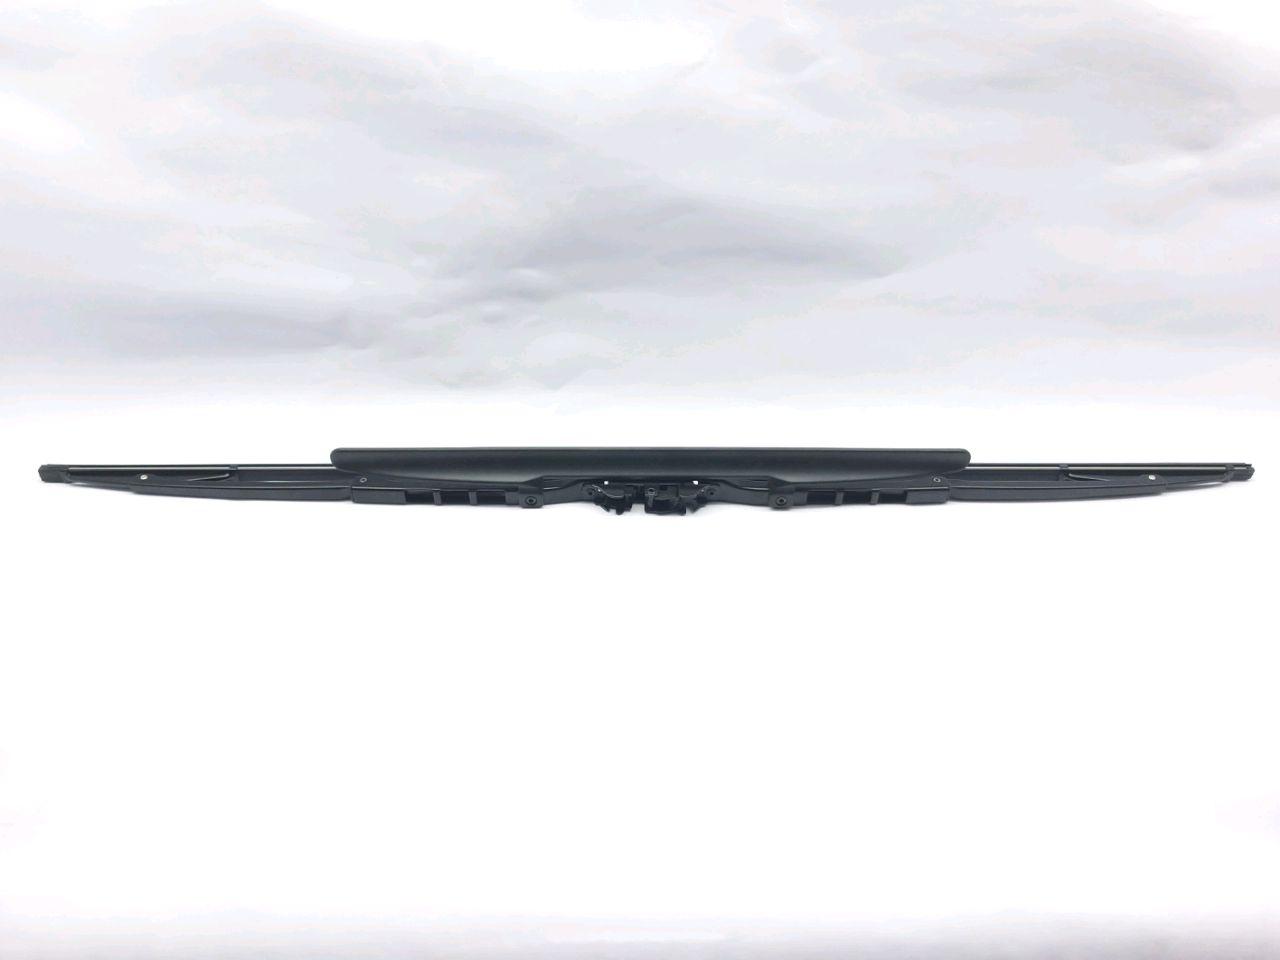 Perie stergatoare p/parbriz 70cm HEYNER Exclusive